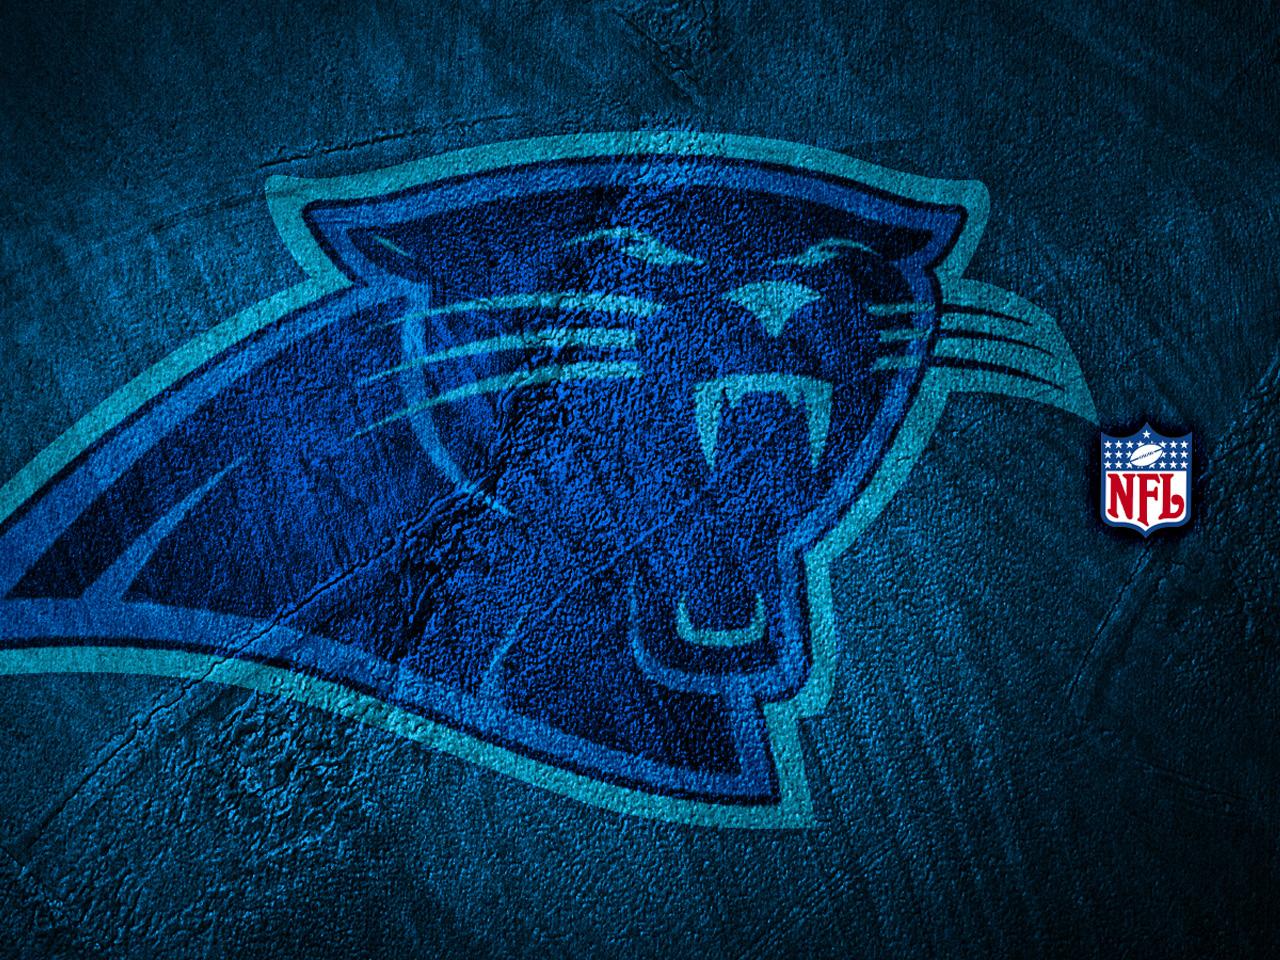 49 Carolina Panthers Wallpaper Football On Wallpapersafari